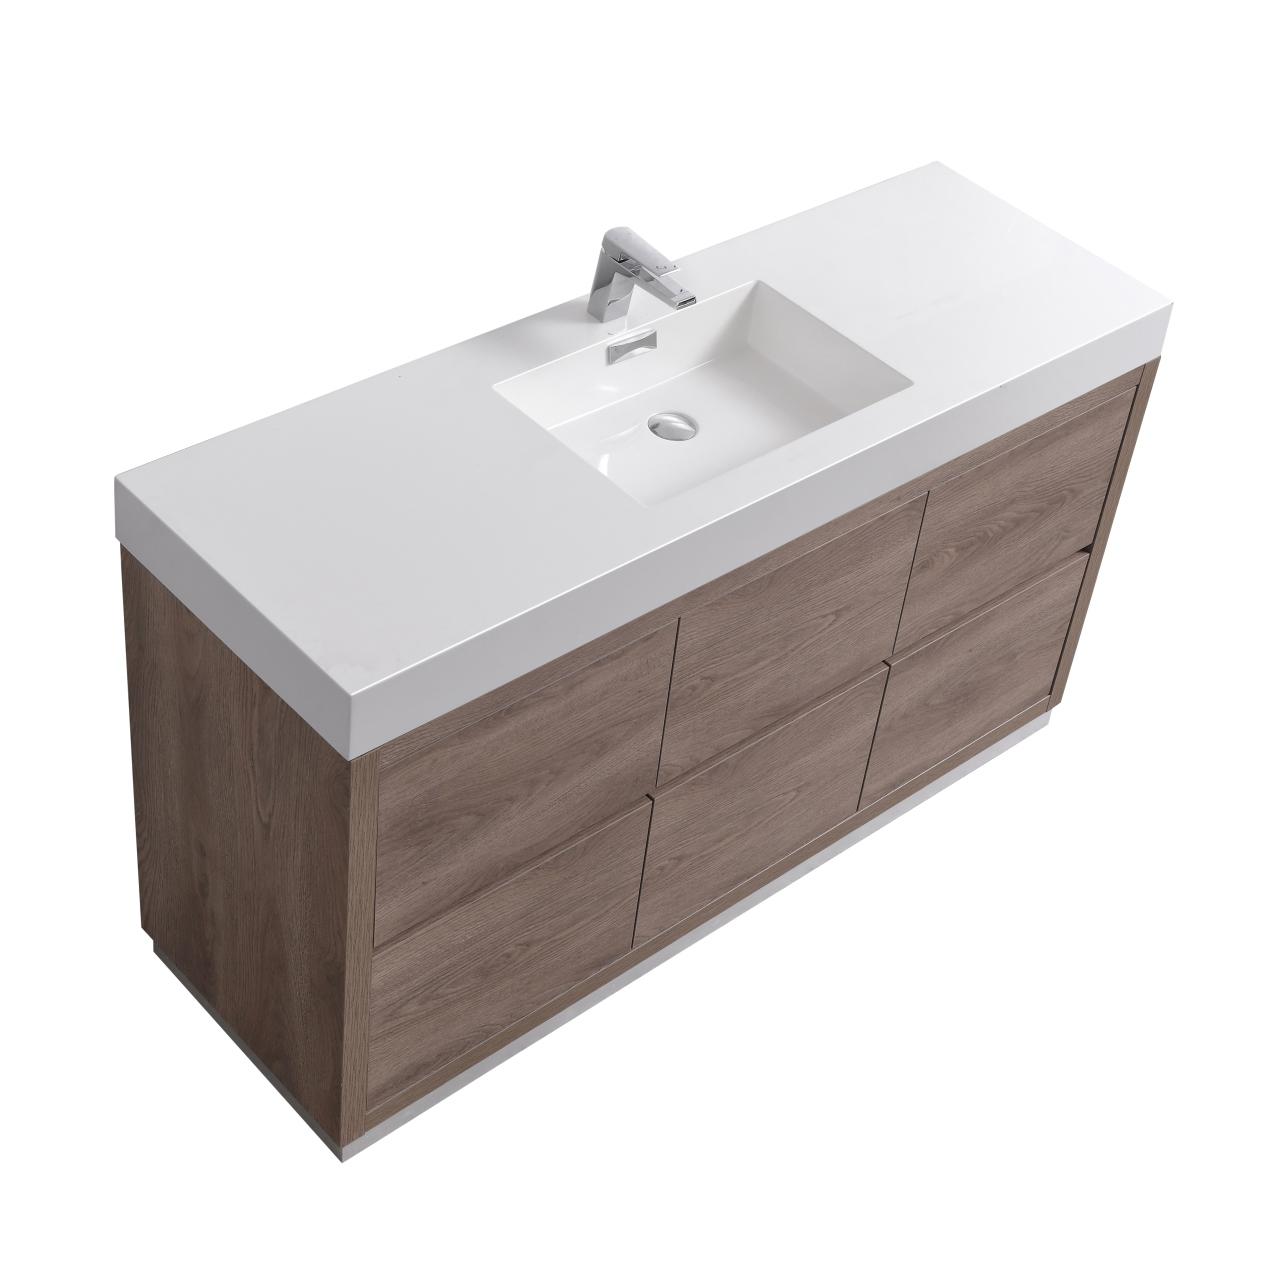 "Modern Lux 60"" Single Sink Butternut  Free Standing Modern Bathroom Vanity"